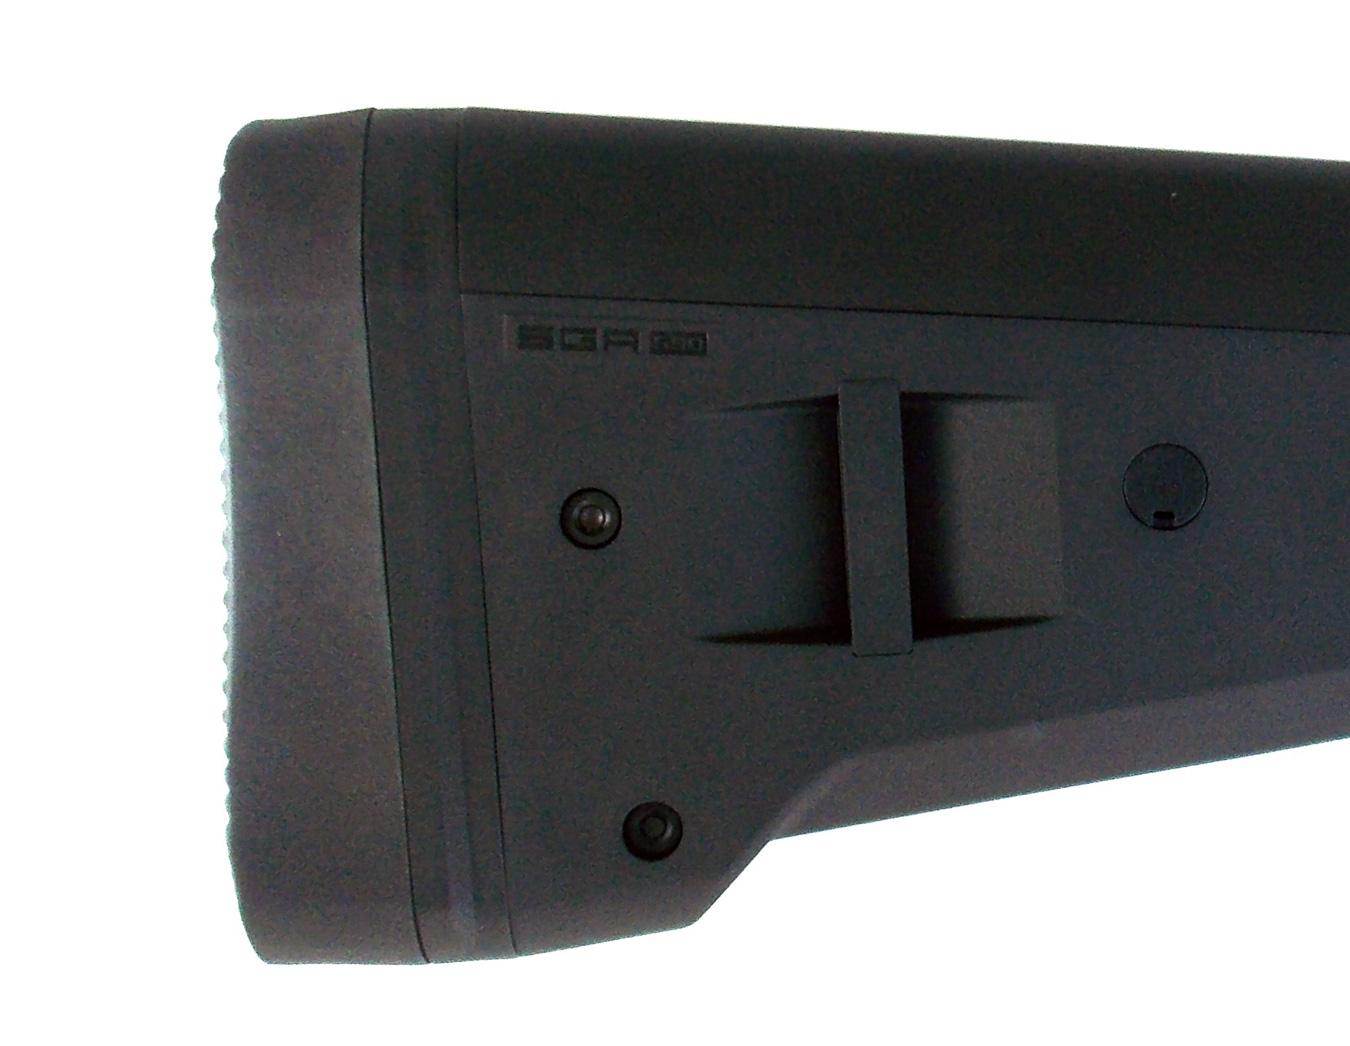 Sling adjustment lugs on the Magpul SGA stock